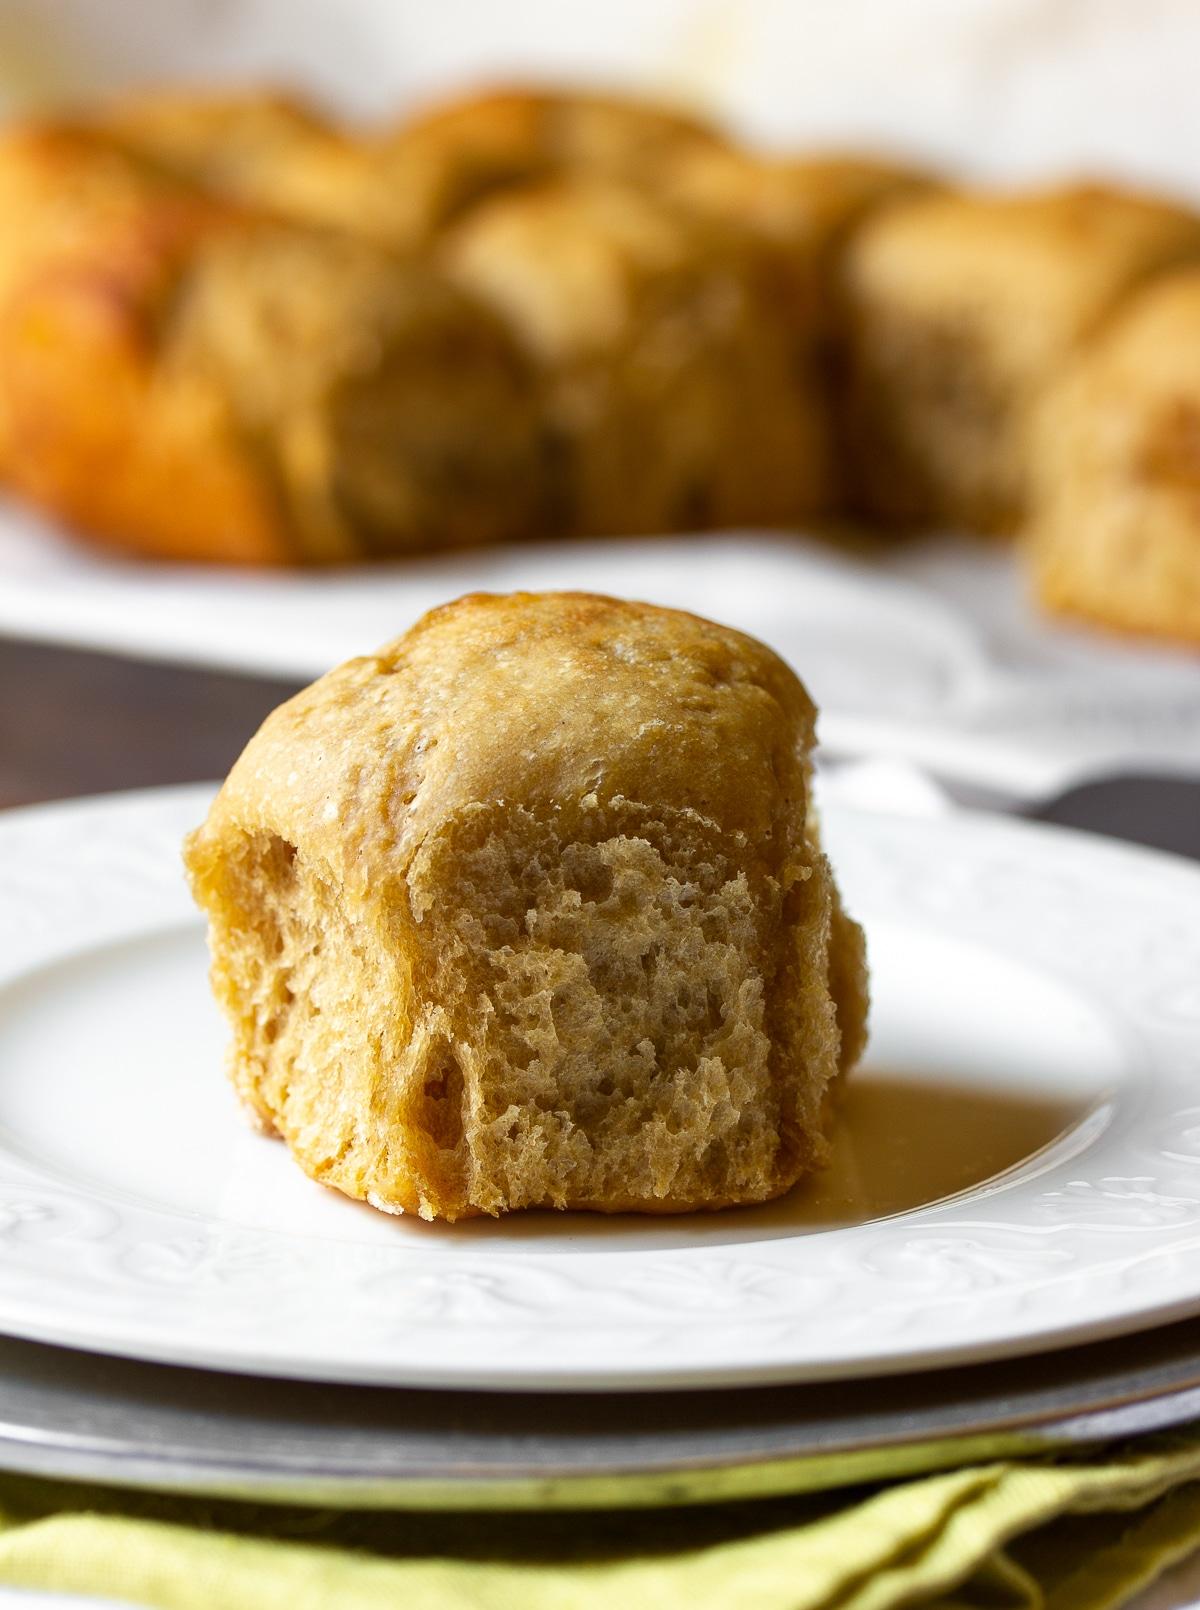 Slow Cooker Yeast Rolls Recipe #ASpicyPerspective #crockpot #slowcooker #thanksgiving #recipes #rolls #bread